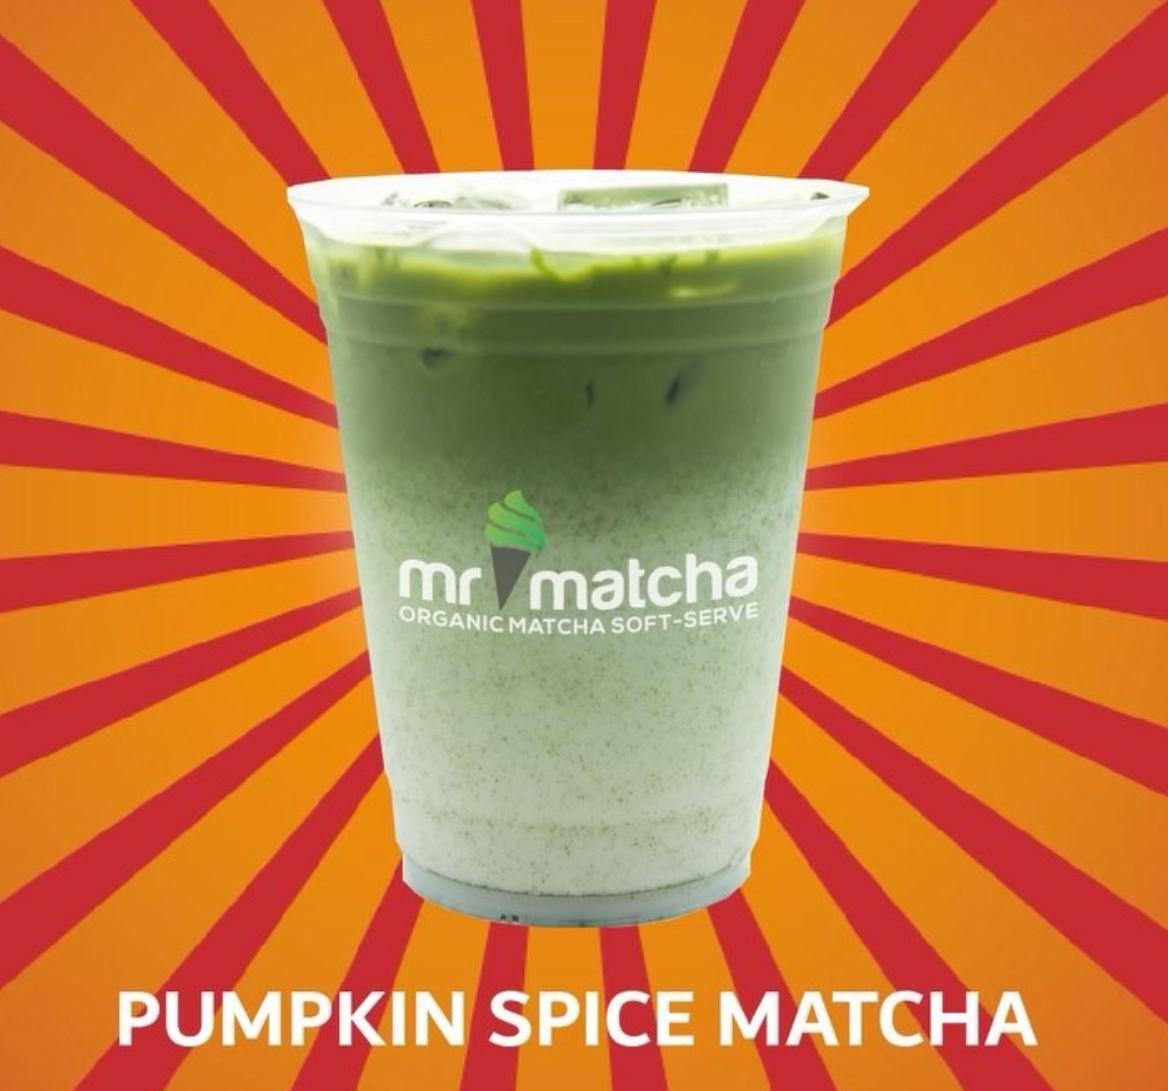 Oct. 2 - 4 | Pumpkin Spice Matcha? BOGO Free @ Mr. Matcha - Garden Grove